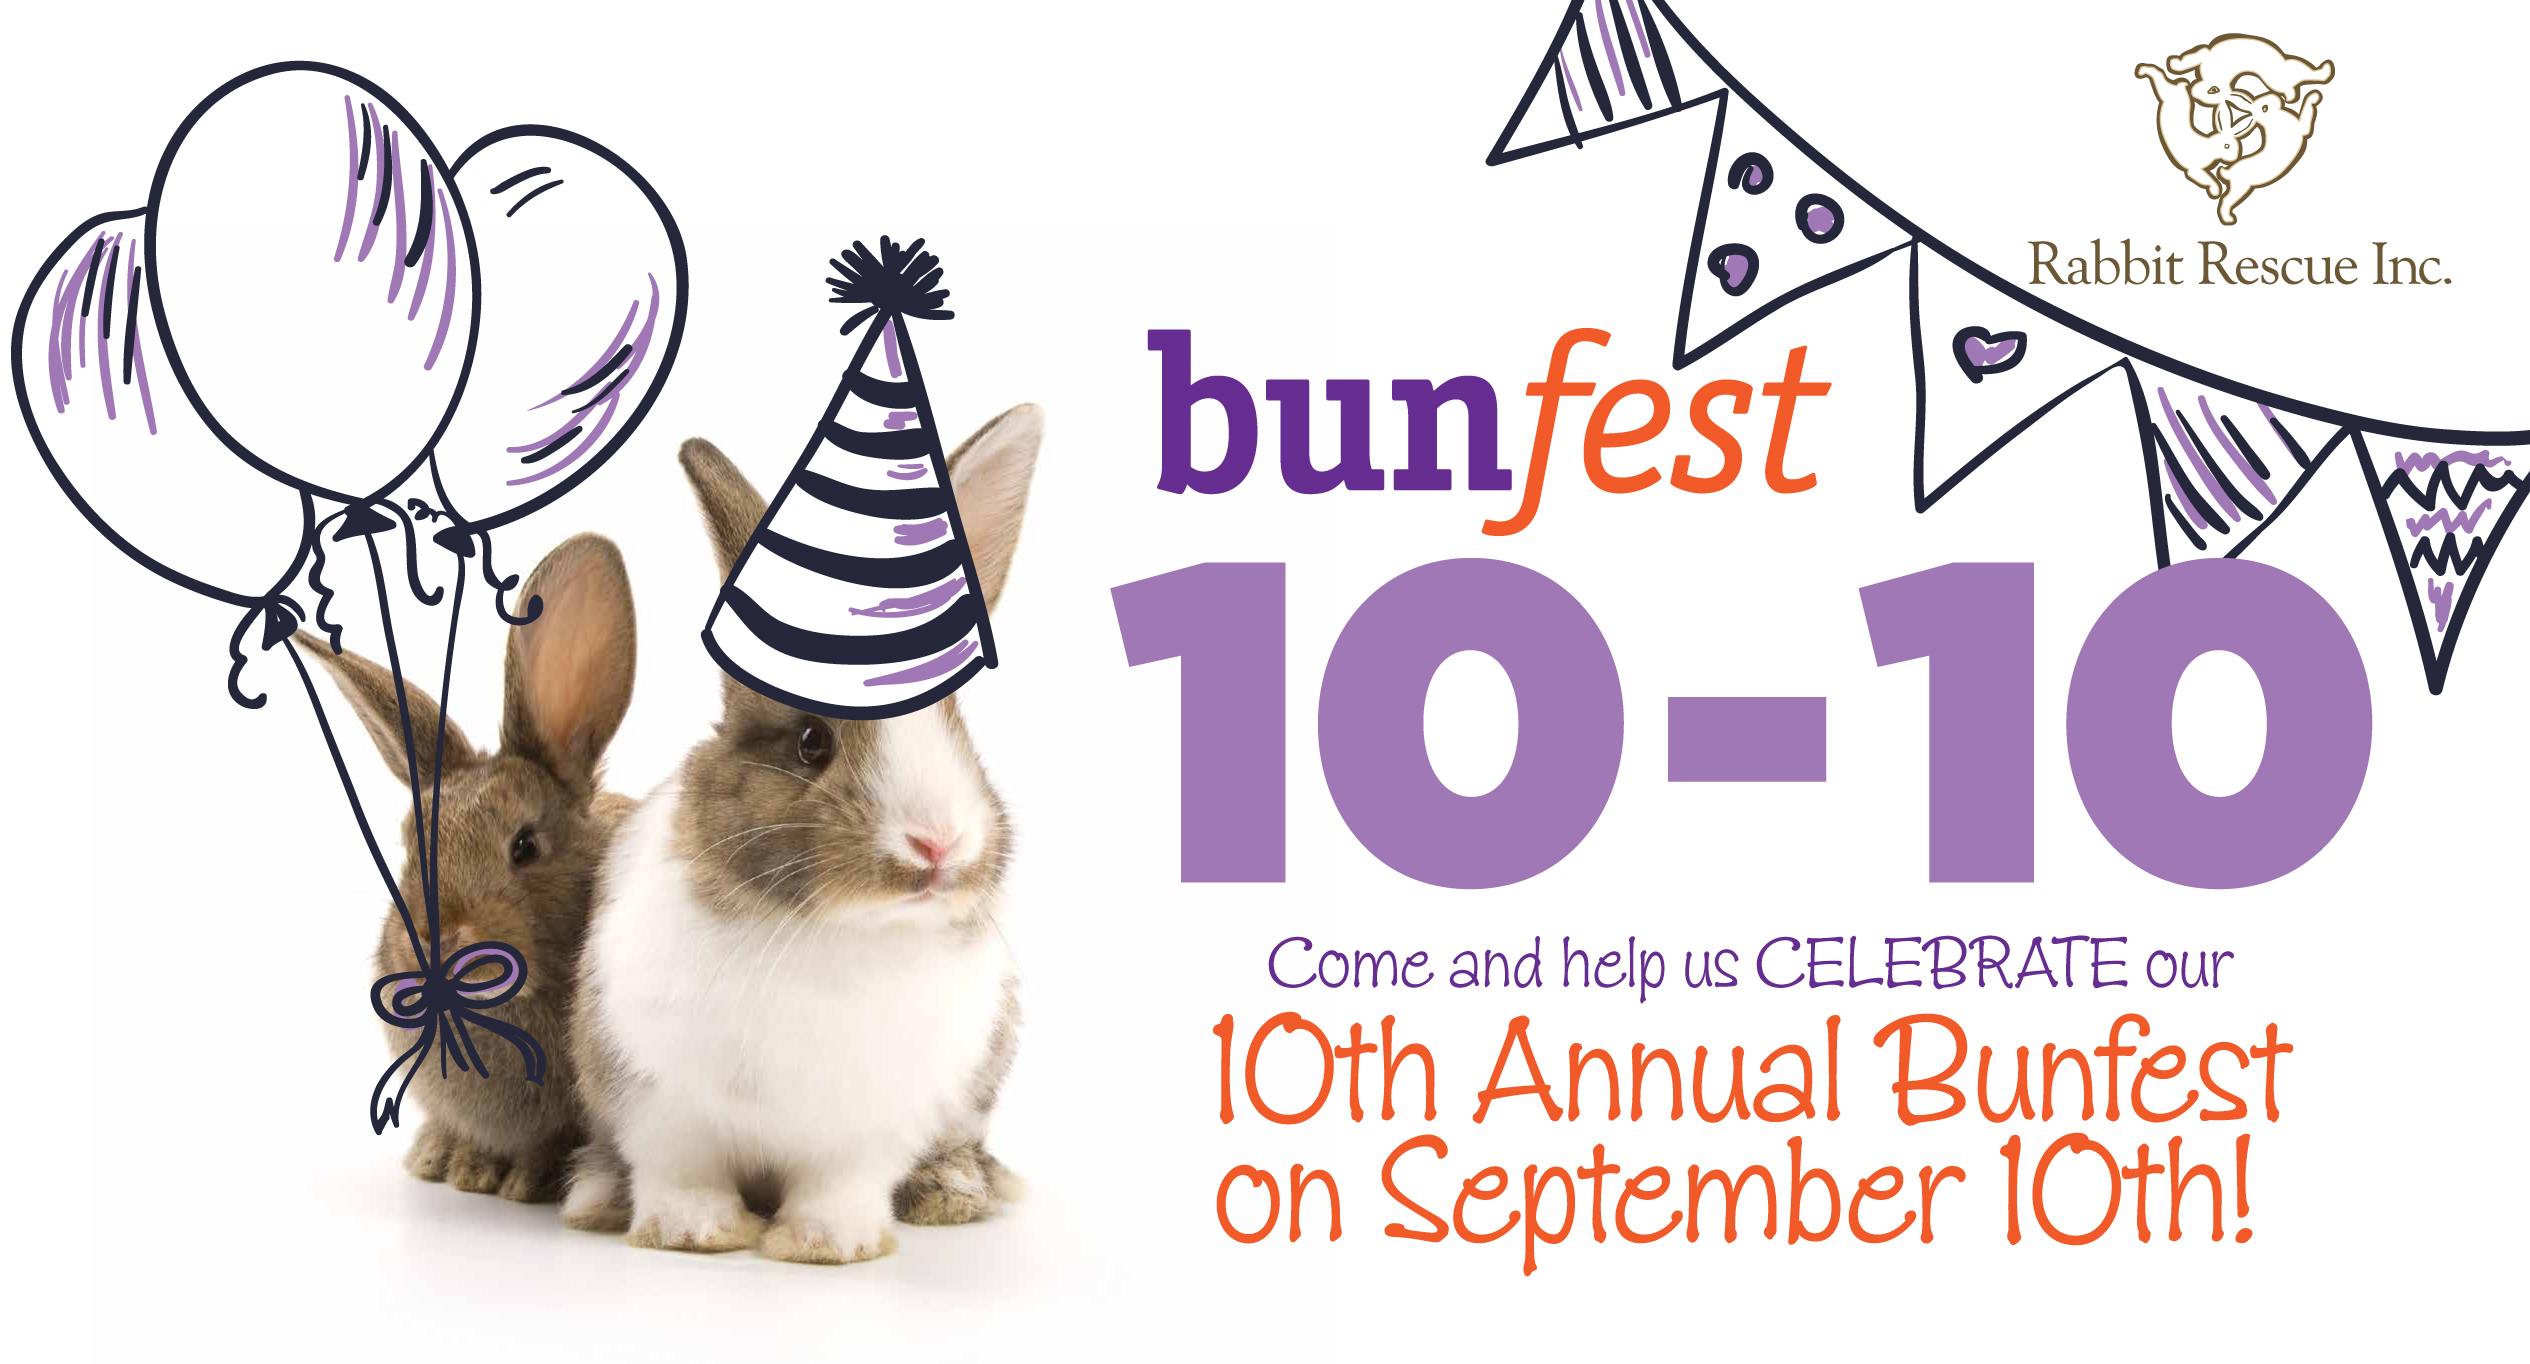 Bunfest10thAnniversary2